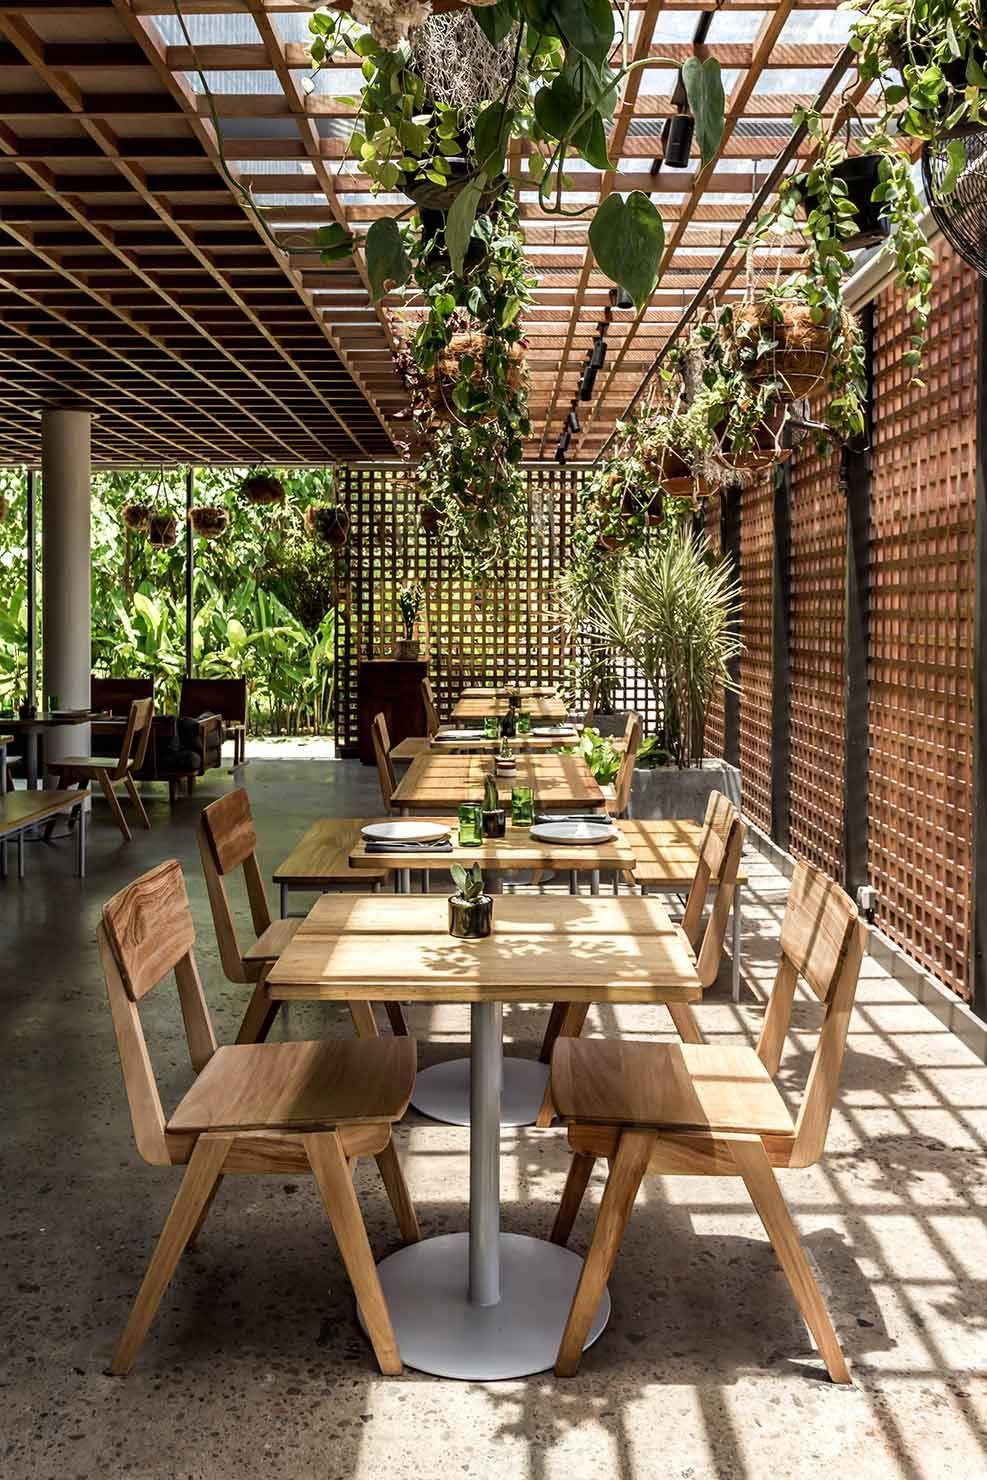 The Slow Bali Interiors Outdoor Restaurant Patio Restaurant Exterior Outdoor Restaurant Design